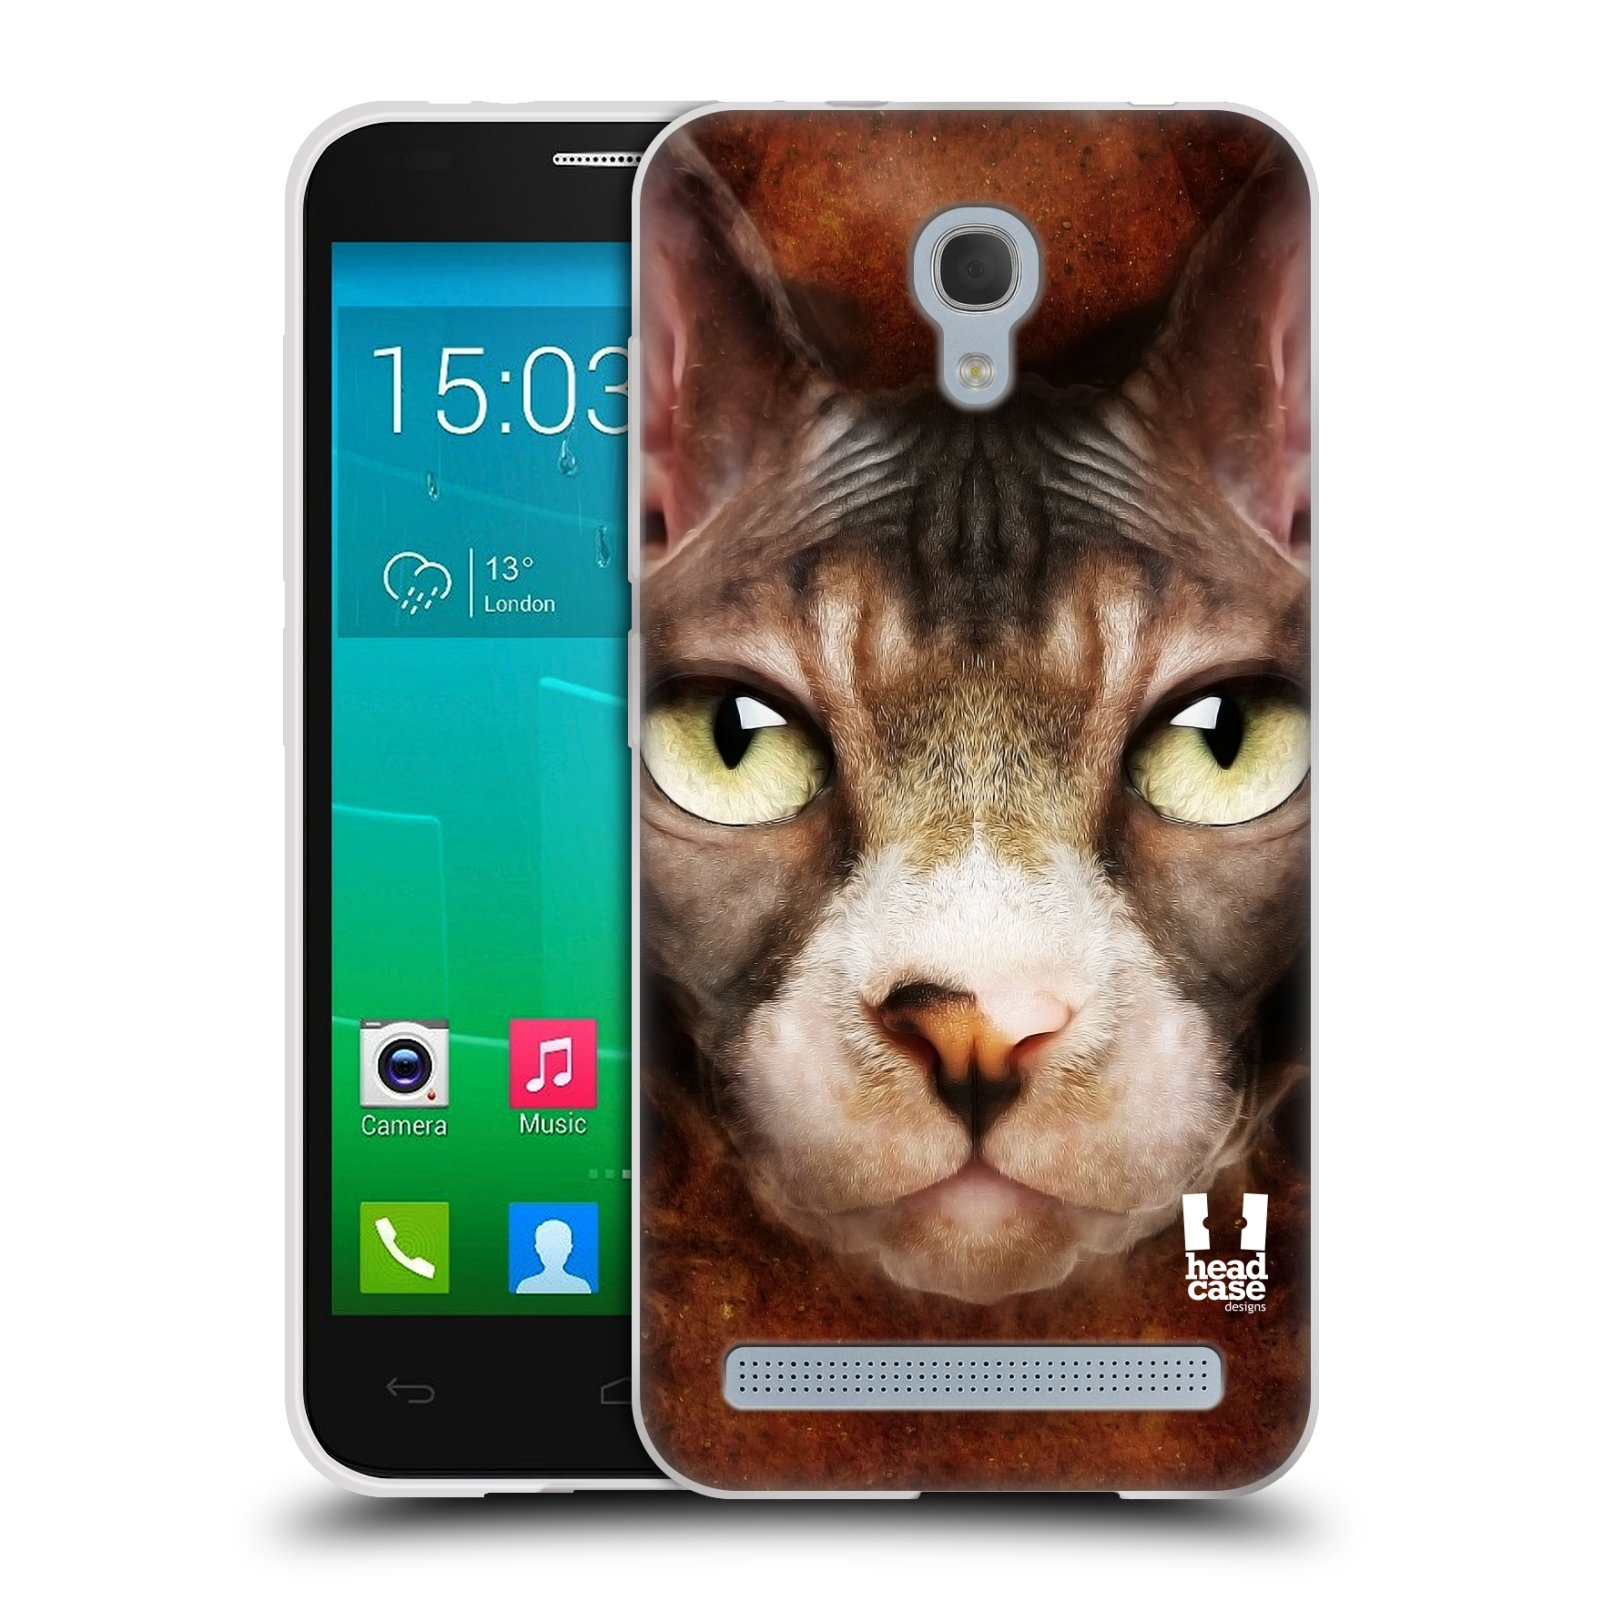 HEAD CASE silikonový obal na mobil Alcatel Idol 2 MINI S 6036Y vzor Zvířecí tváře kočka sphynx